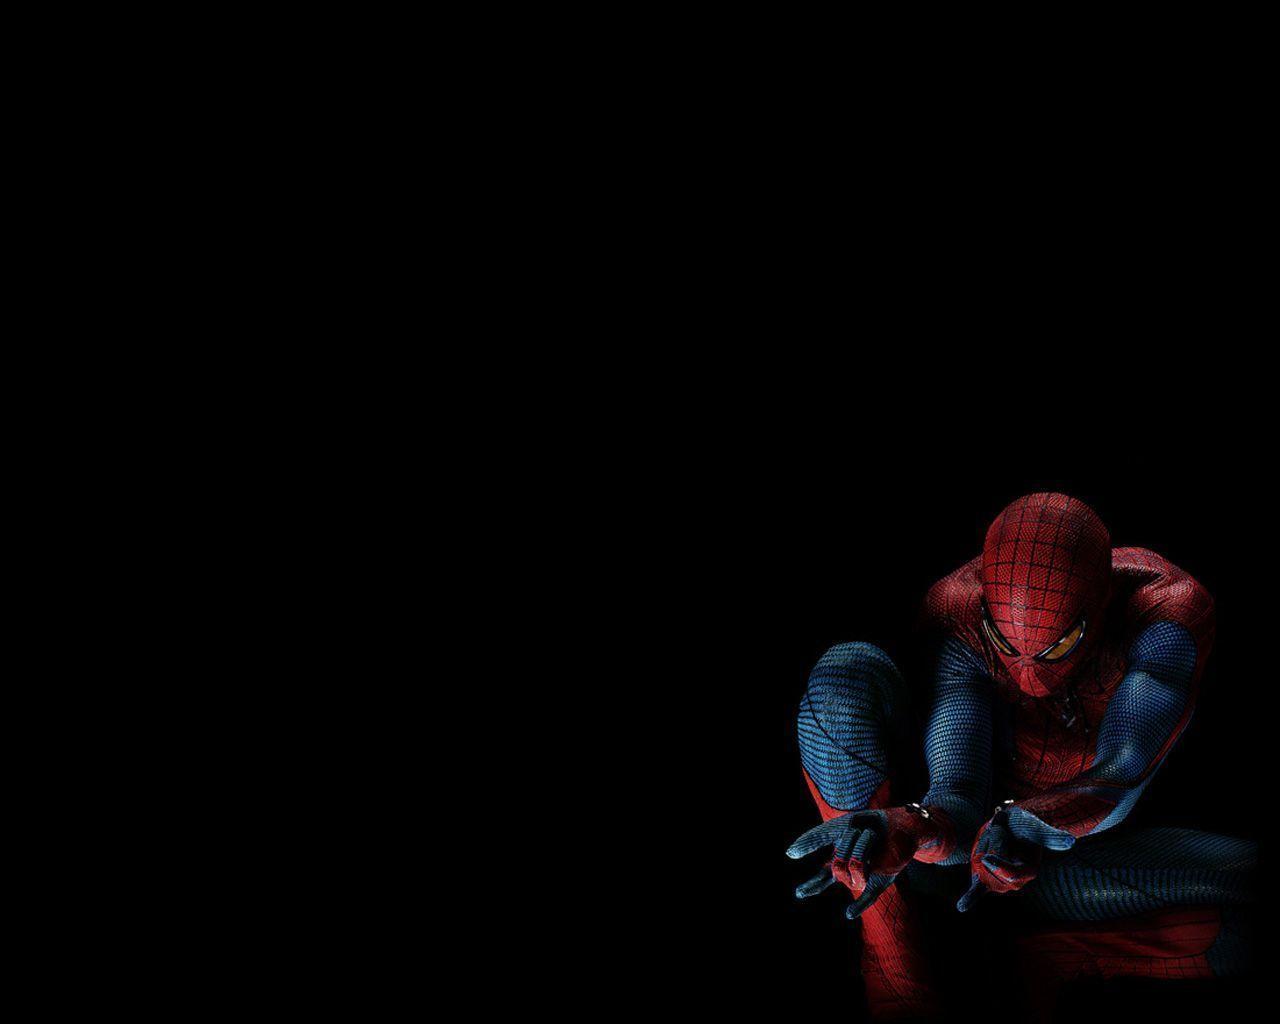 Amazing Spiderman Wallpaper